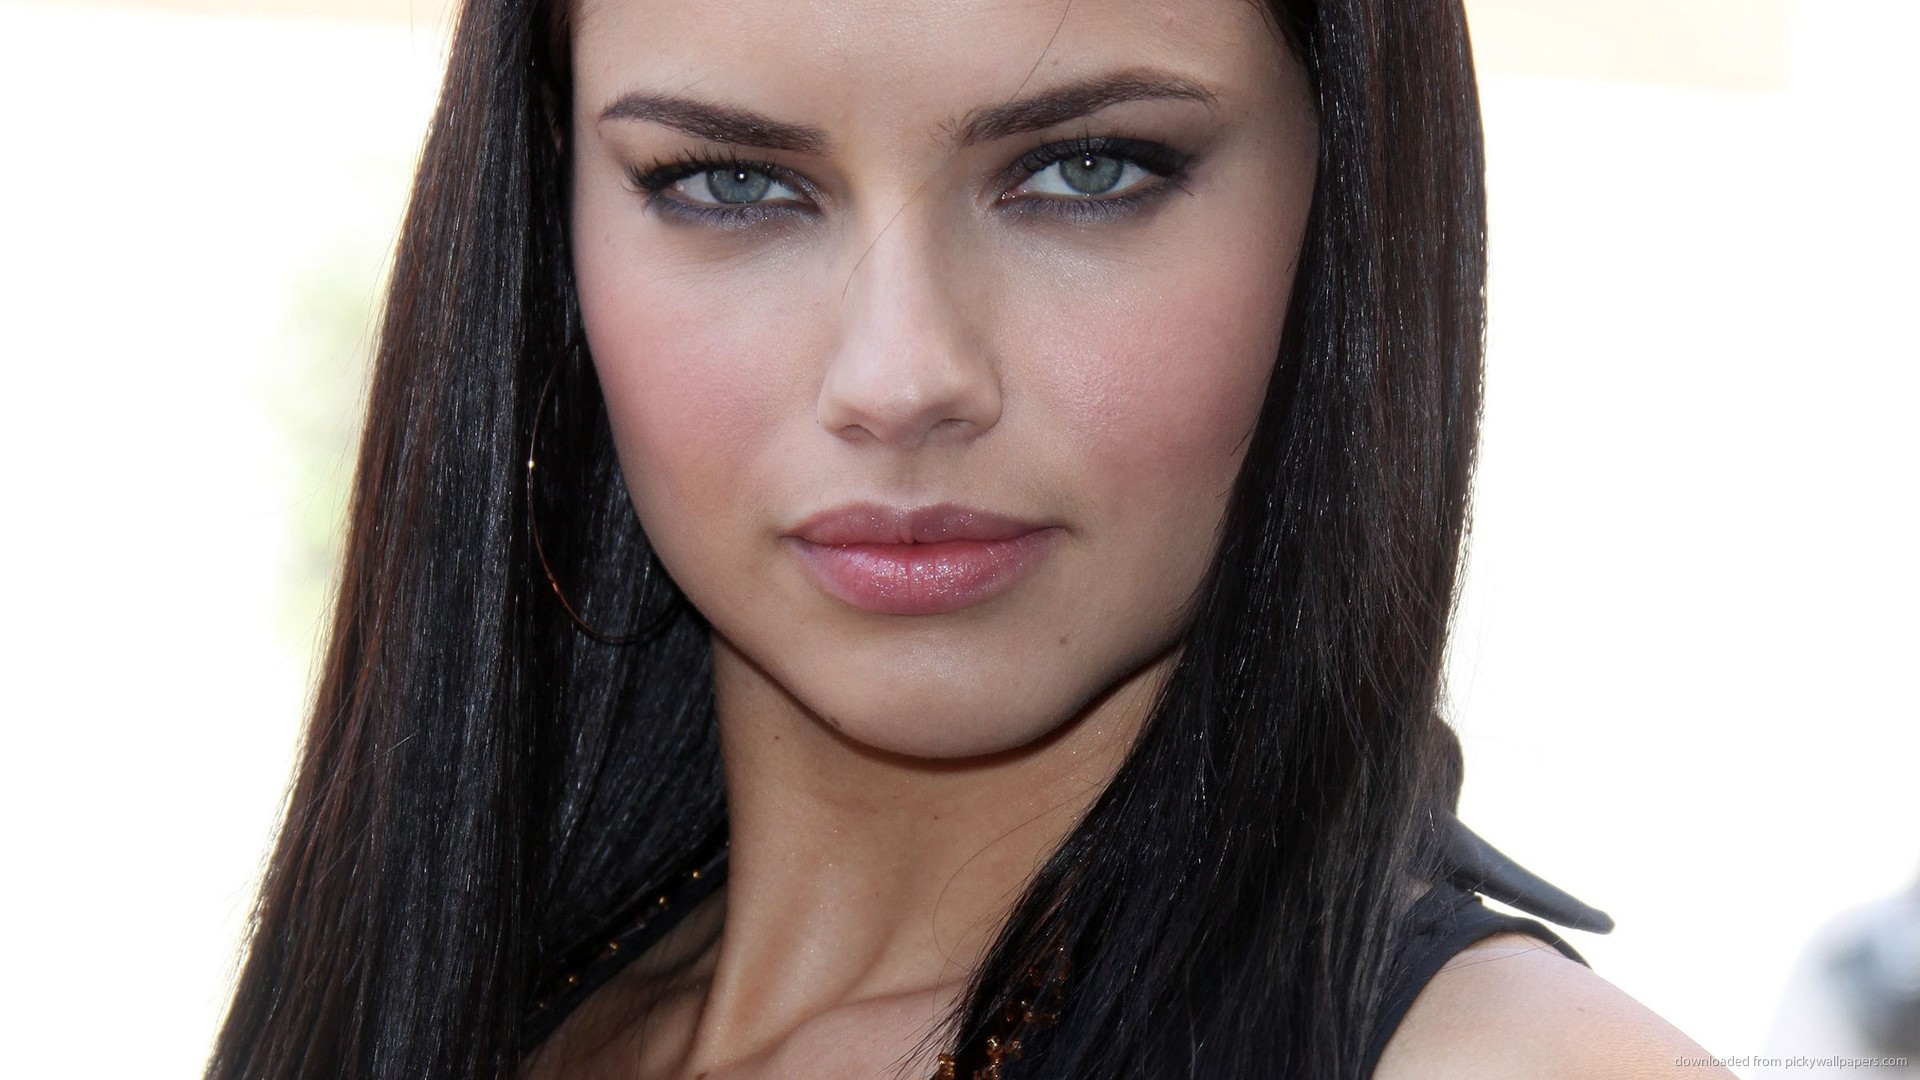 Adriana lima2 nude (36 pics)